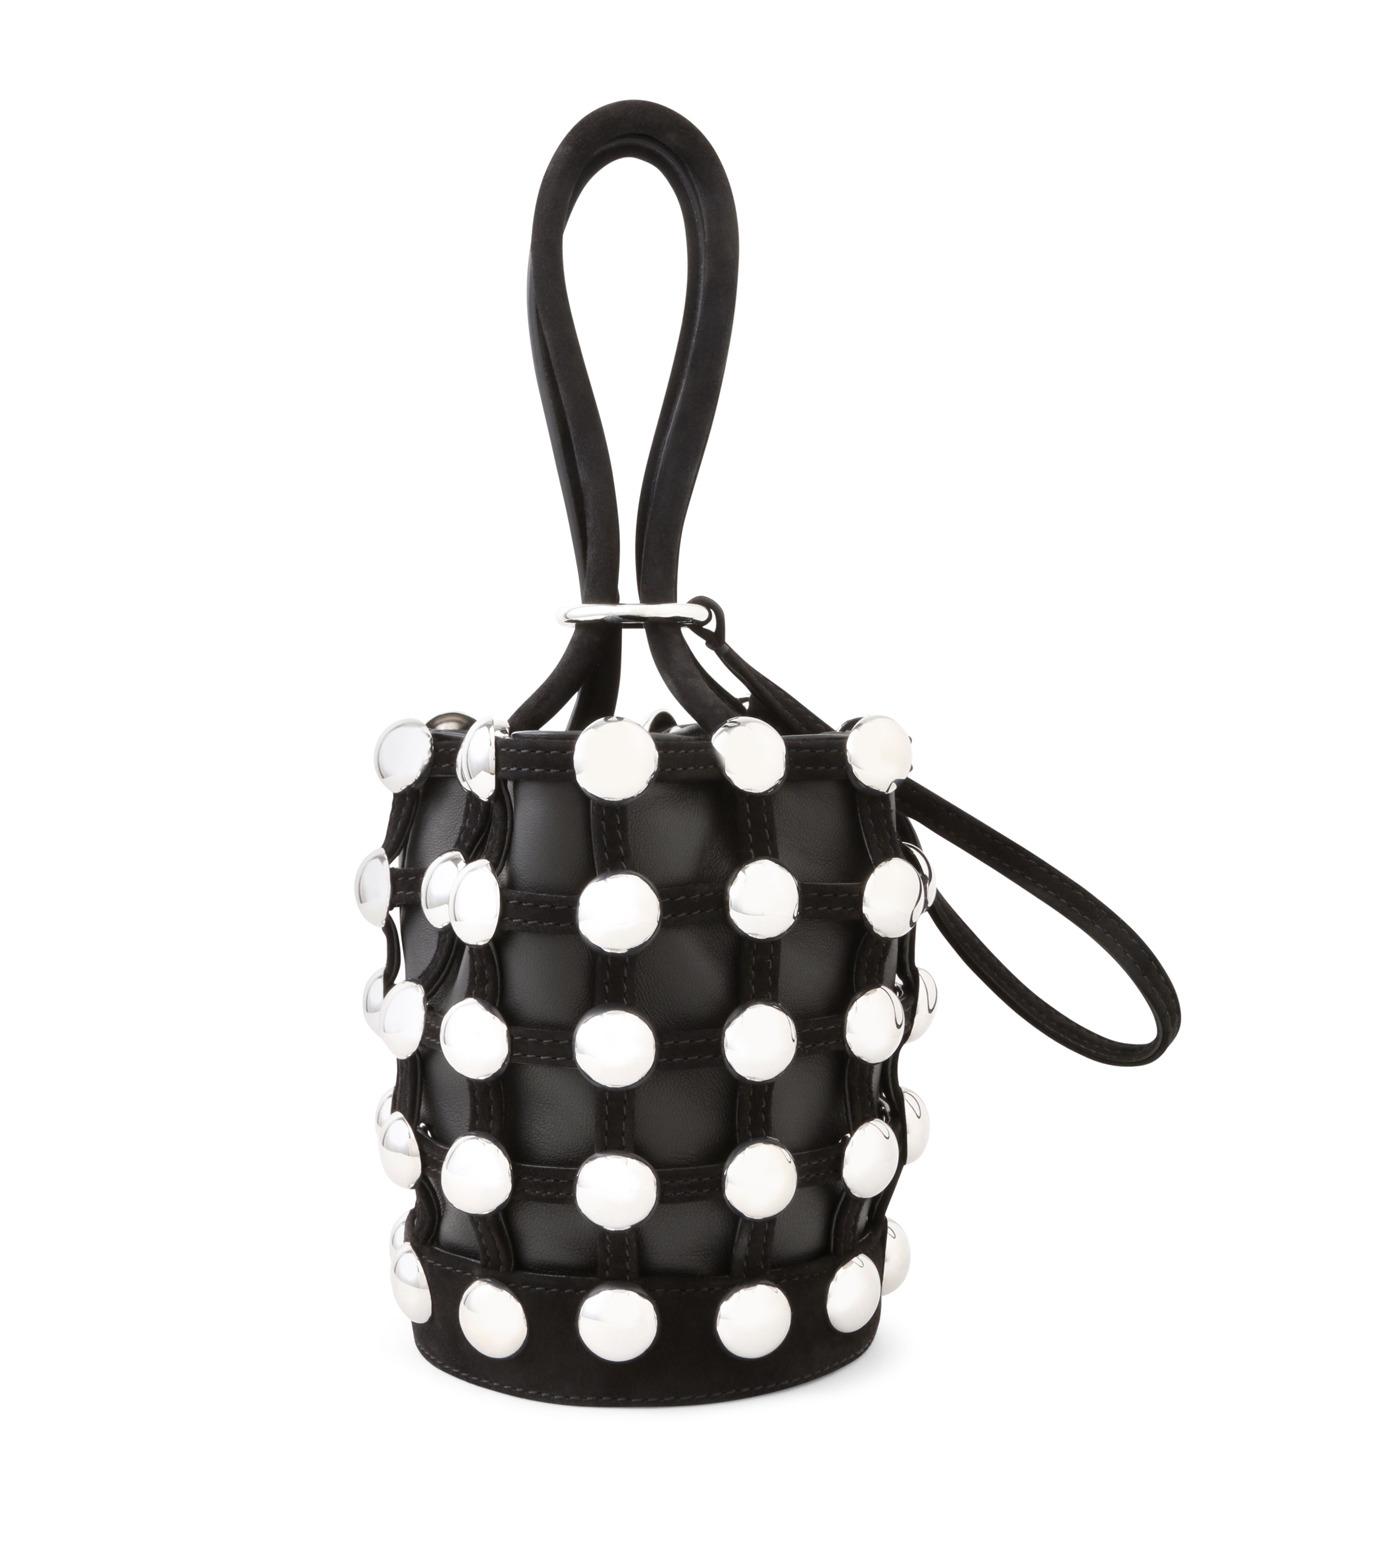 Alexander Wang(アレキサンダーワン)のRoxi Mini Bucket w/Studs-BLACK(ハンドバッグ/hand bag)-20C0038-13 拡大詳細画像3